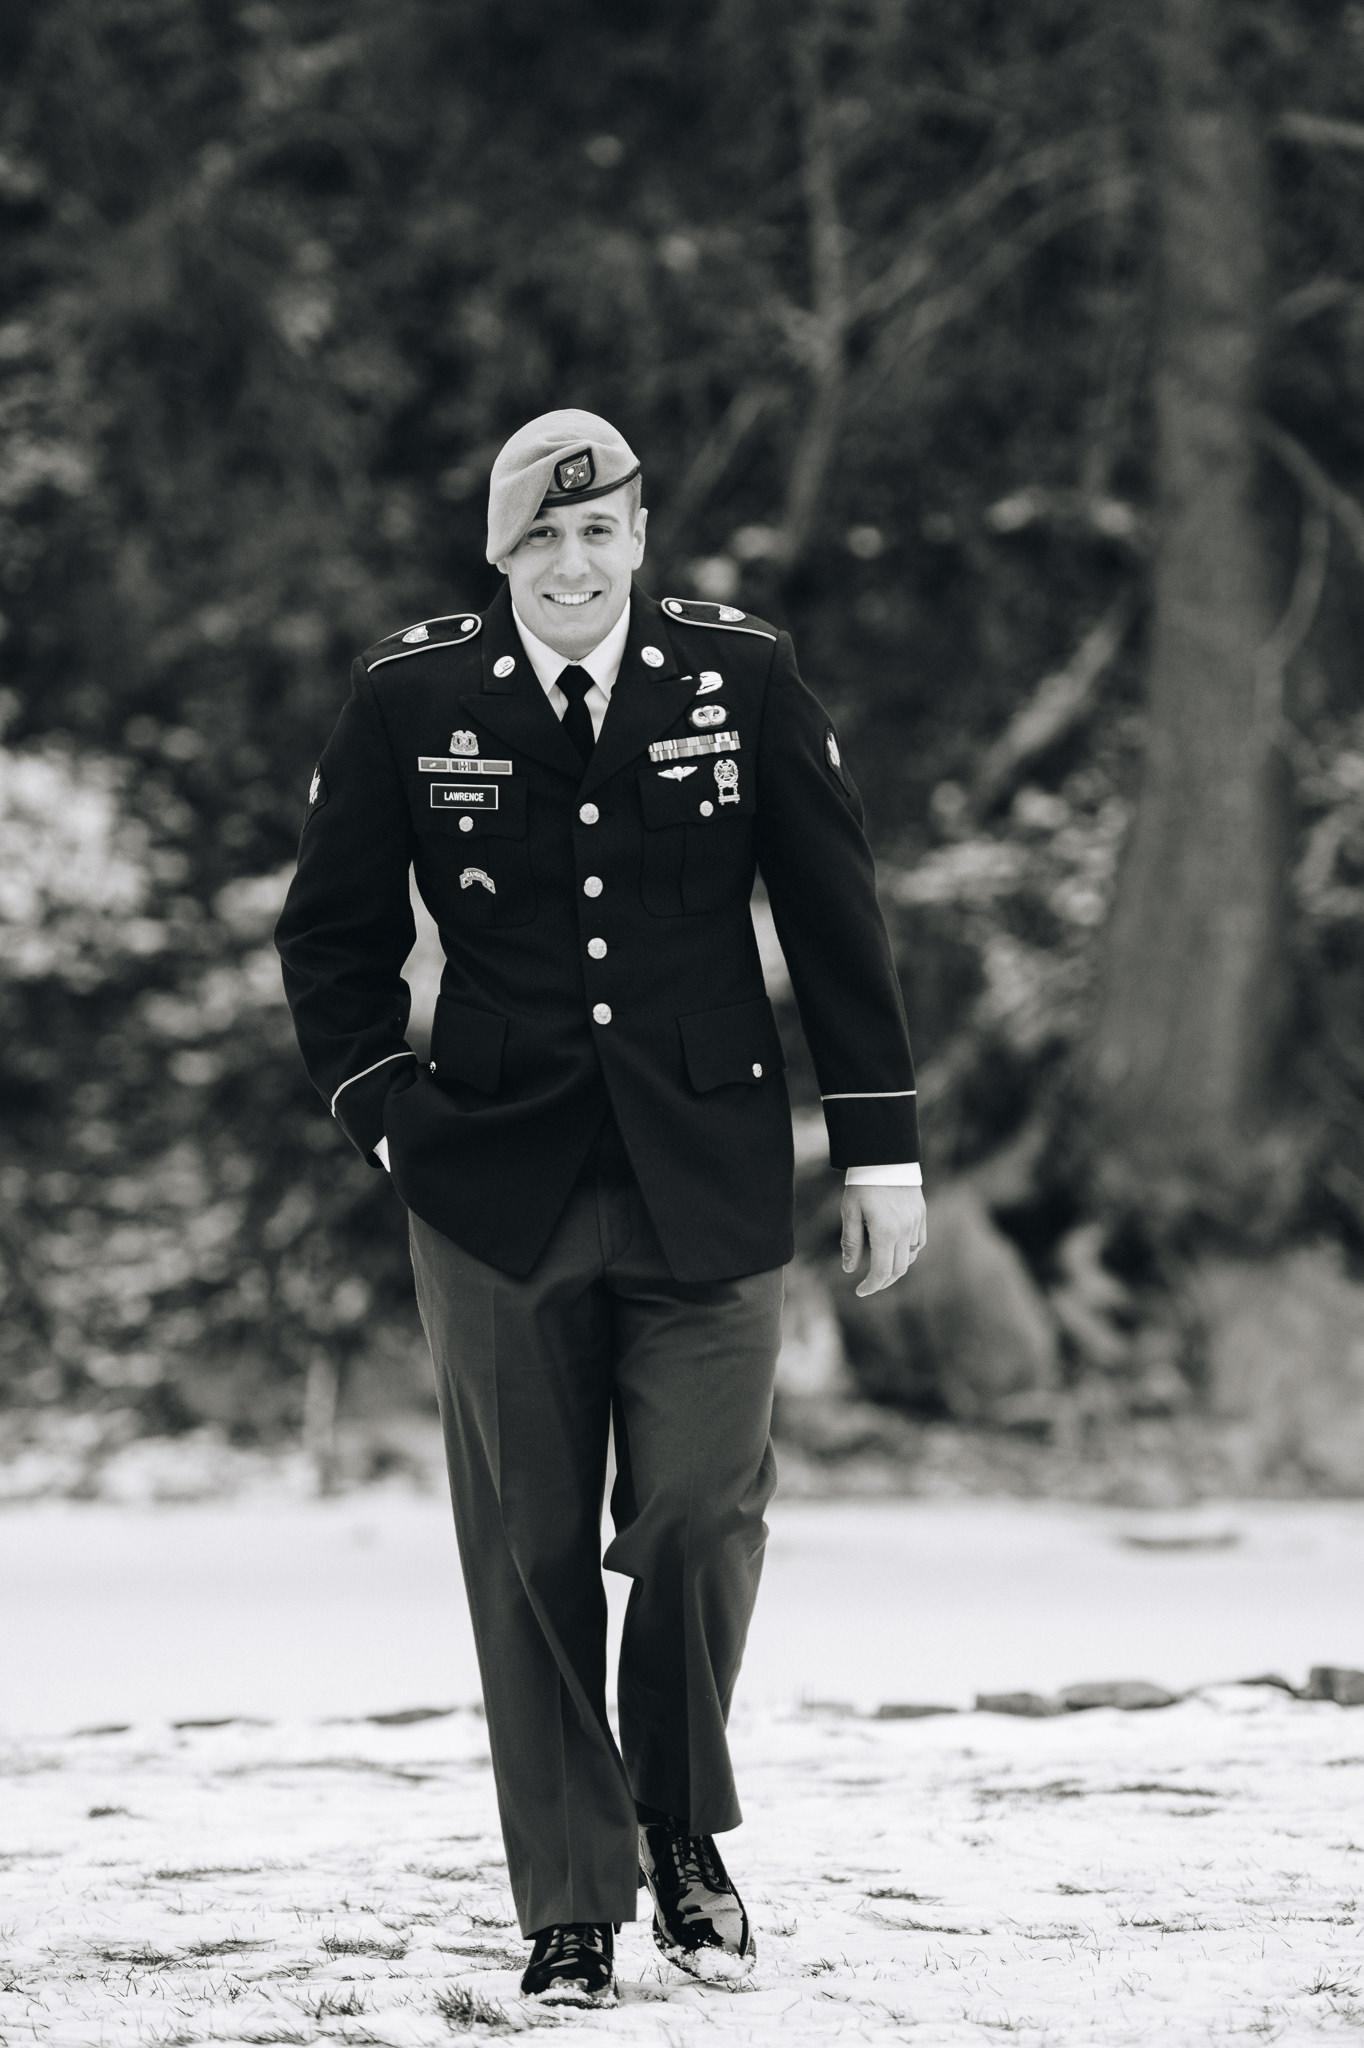 Trevor-Hooper-Wedding-Photographer-The-Bungalow-Wedding-Utah_BW_010.jpg